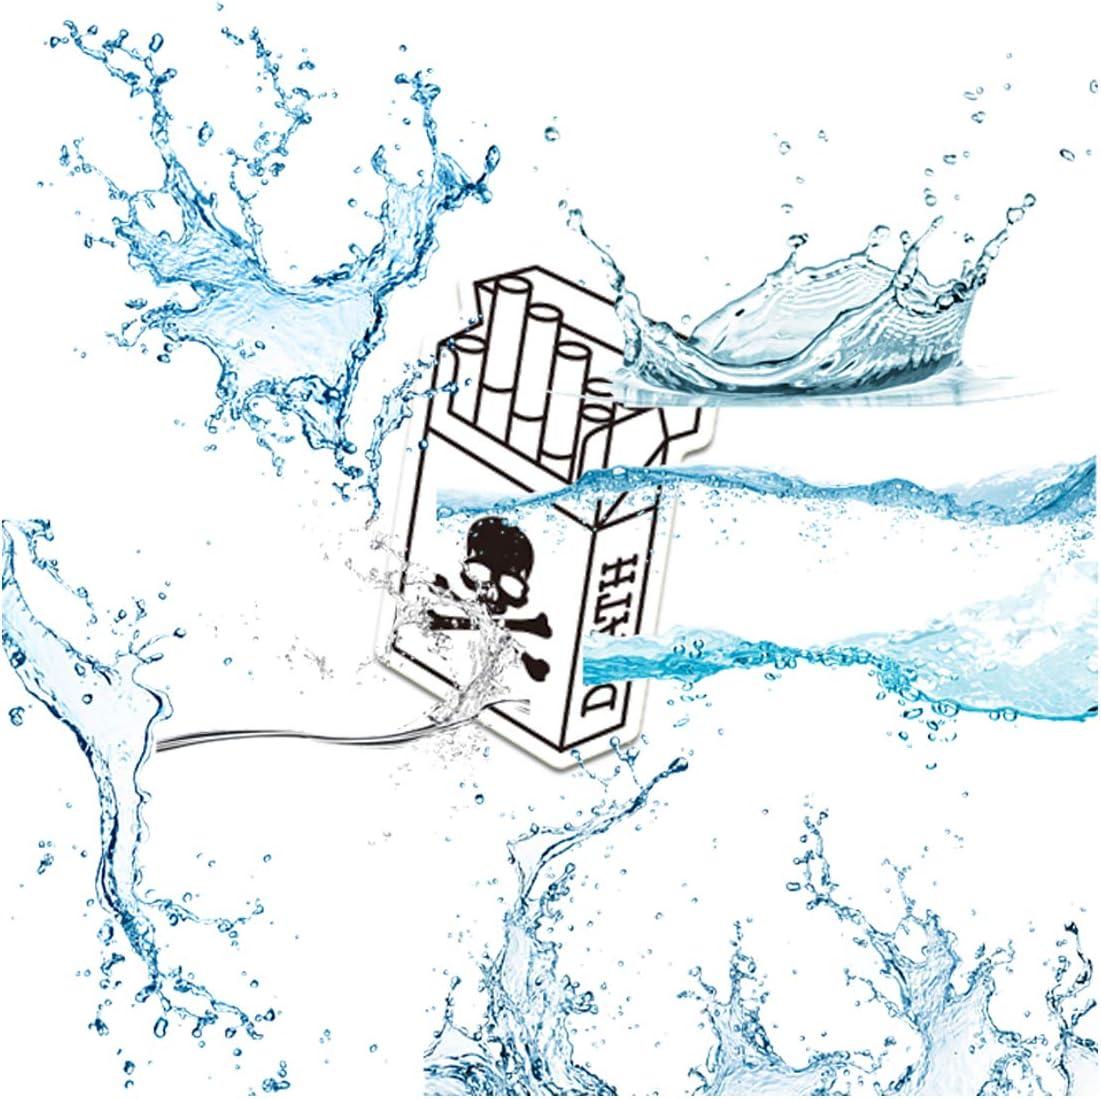 Vinyl Waterproof Stickers for Laptop,Bumper,Skateboard,Water Bottles,Computer,Phone,Terror Game Stickers Potota Five Nights at Freddys Stickers Five Nights at Freddys 50 PCS